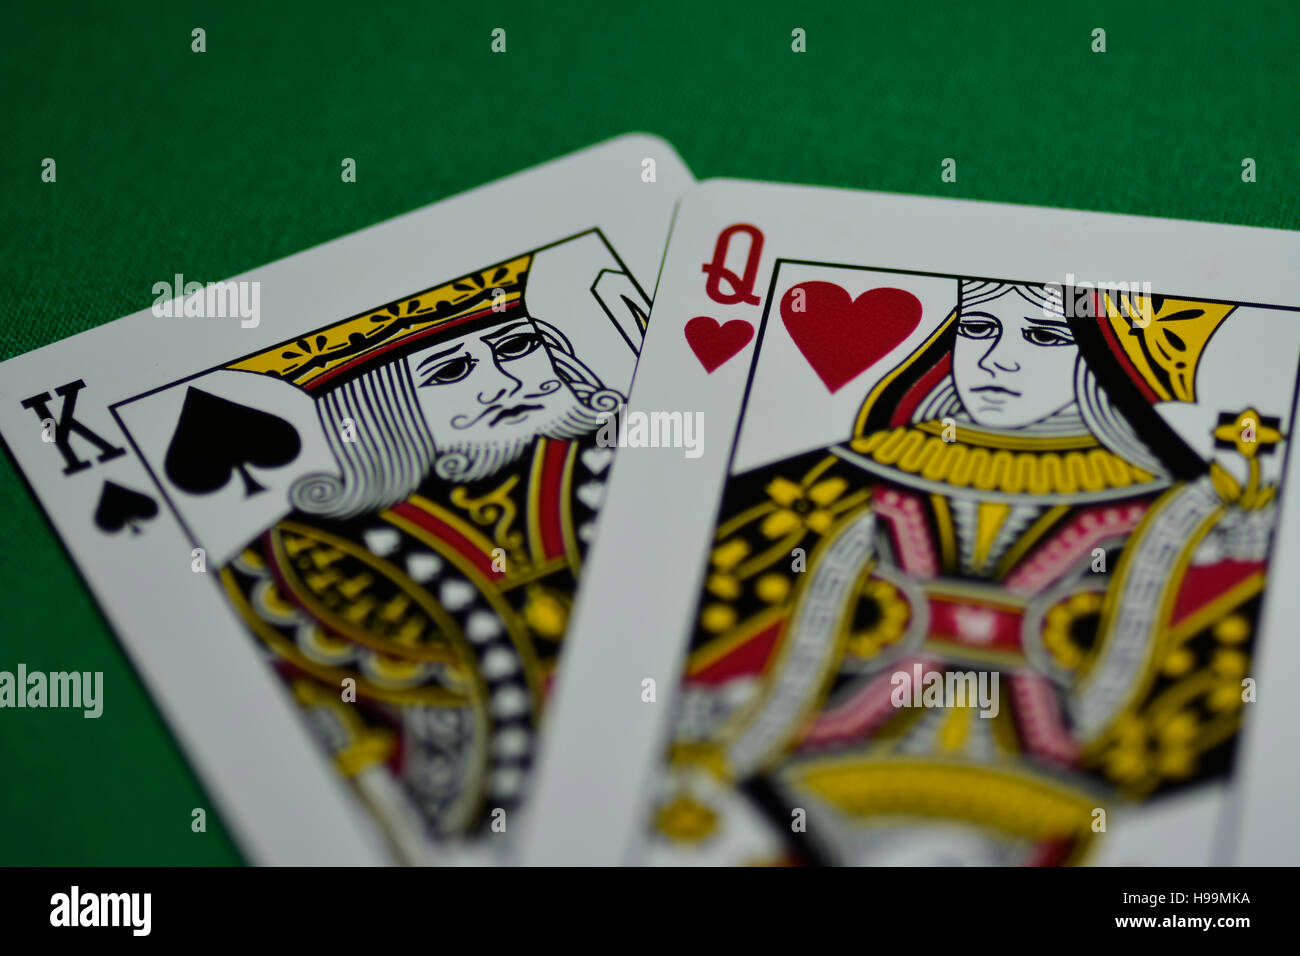 Card Peak King Queen Game Poker Gambling Stock Photo Alamy